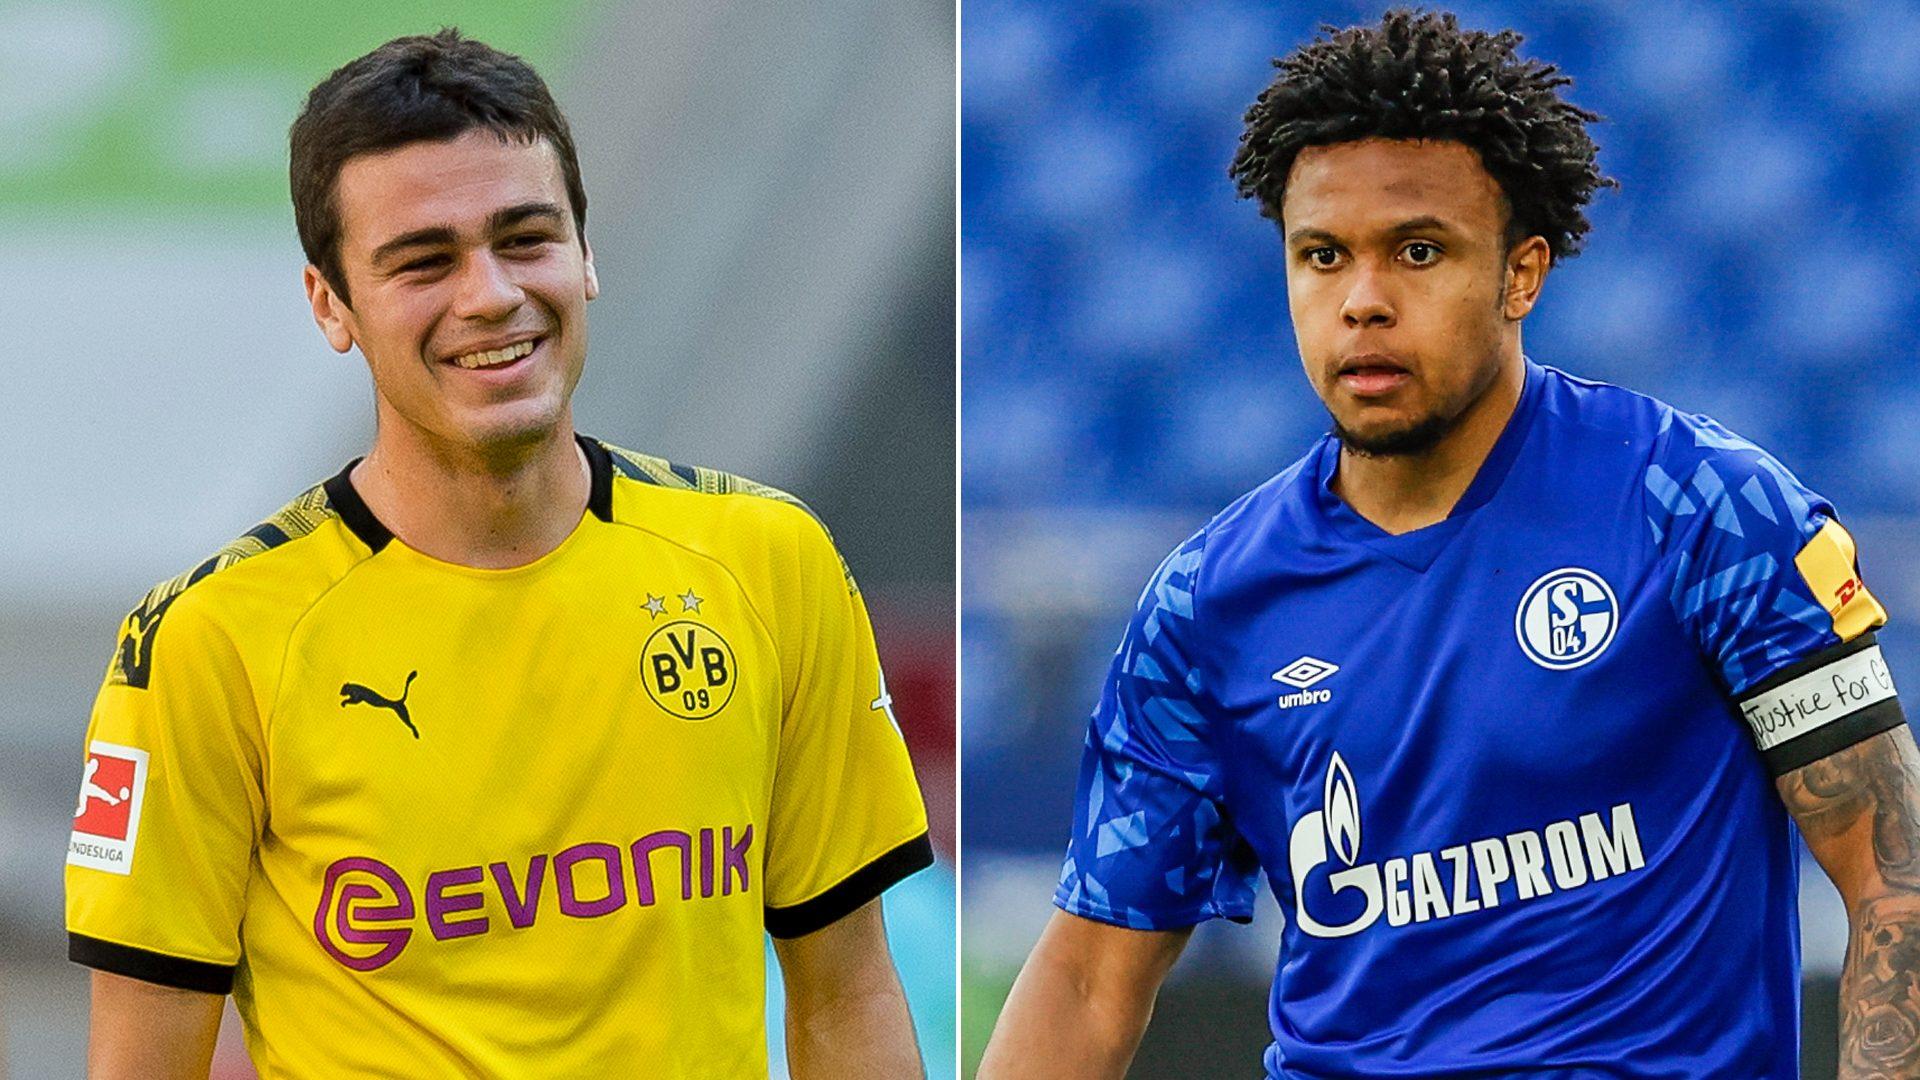 Top 10 USMNT players in the Bundesliga